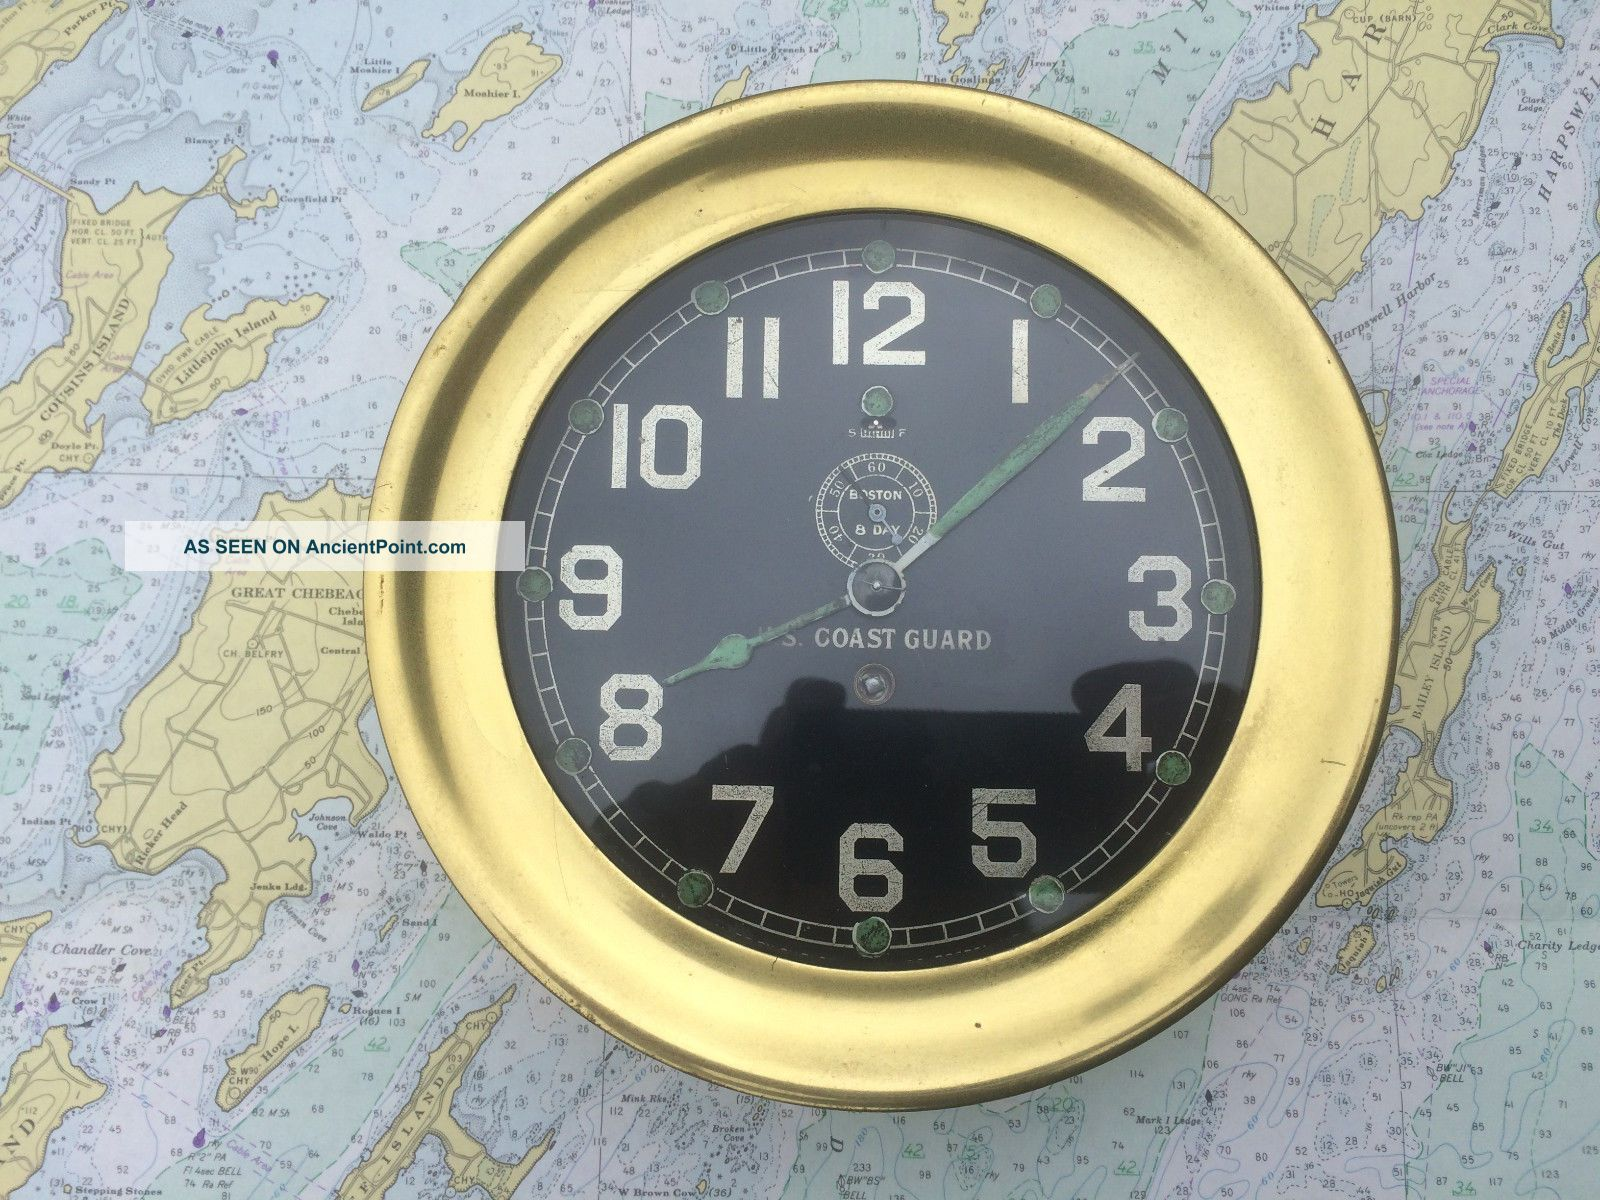 Chelsea 8 Day Vintage U.  S.  Coast Guard Brass Ships Clock Maritime Ww2 Ww1 Clocks photo